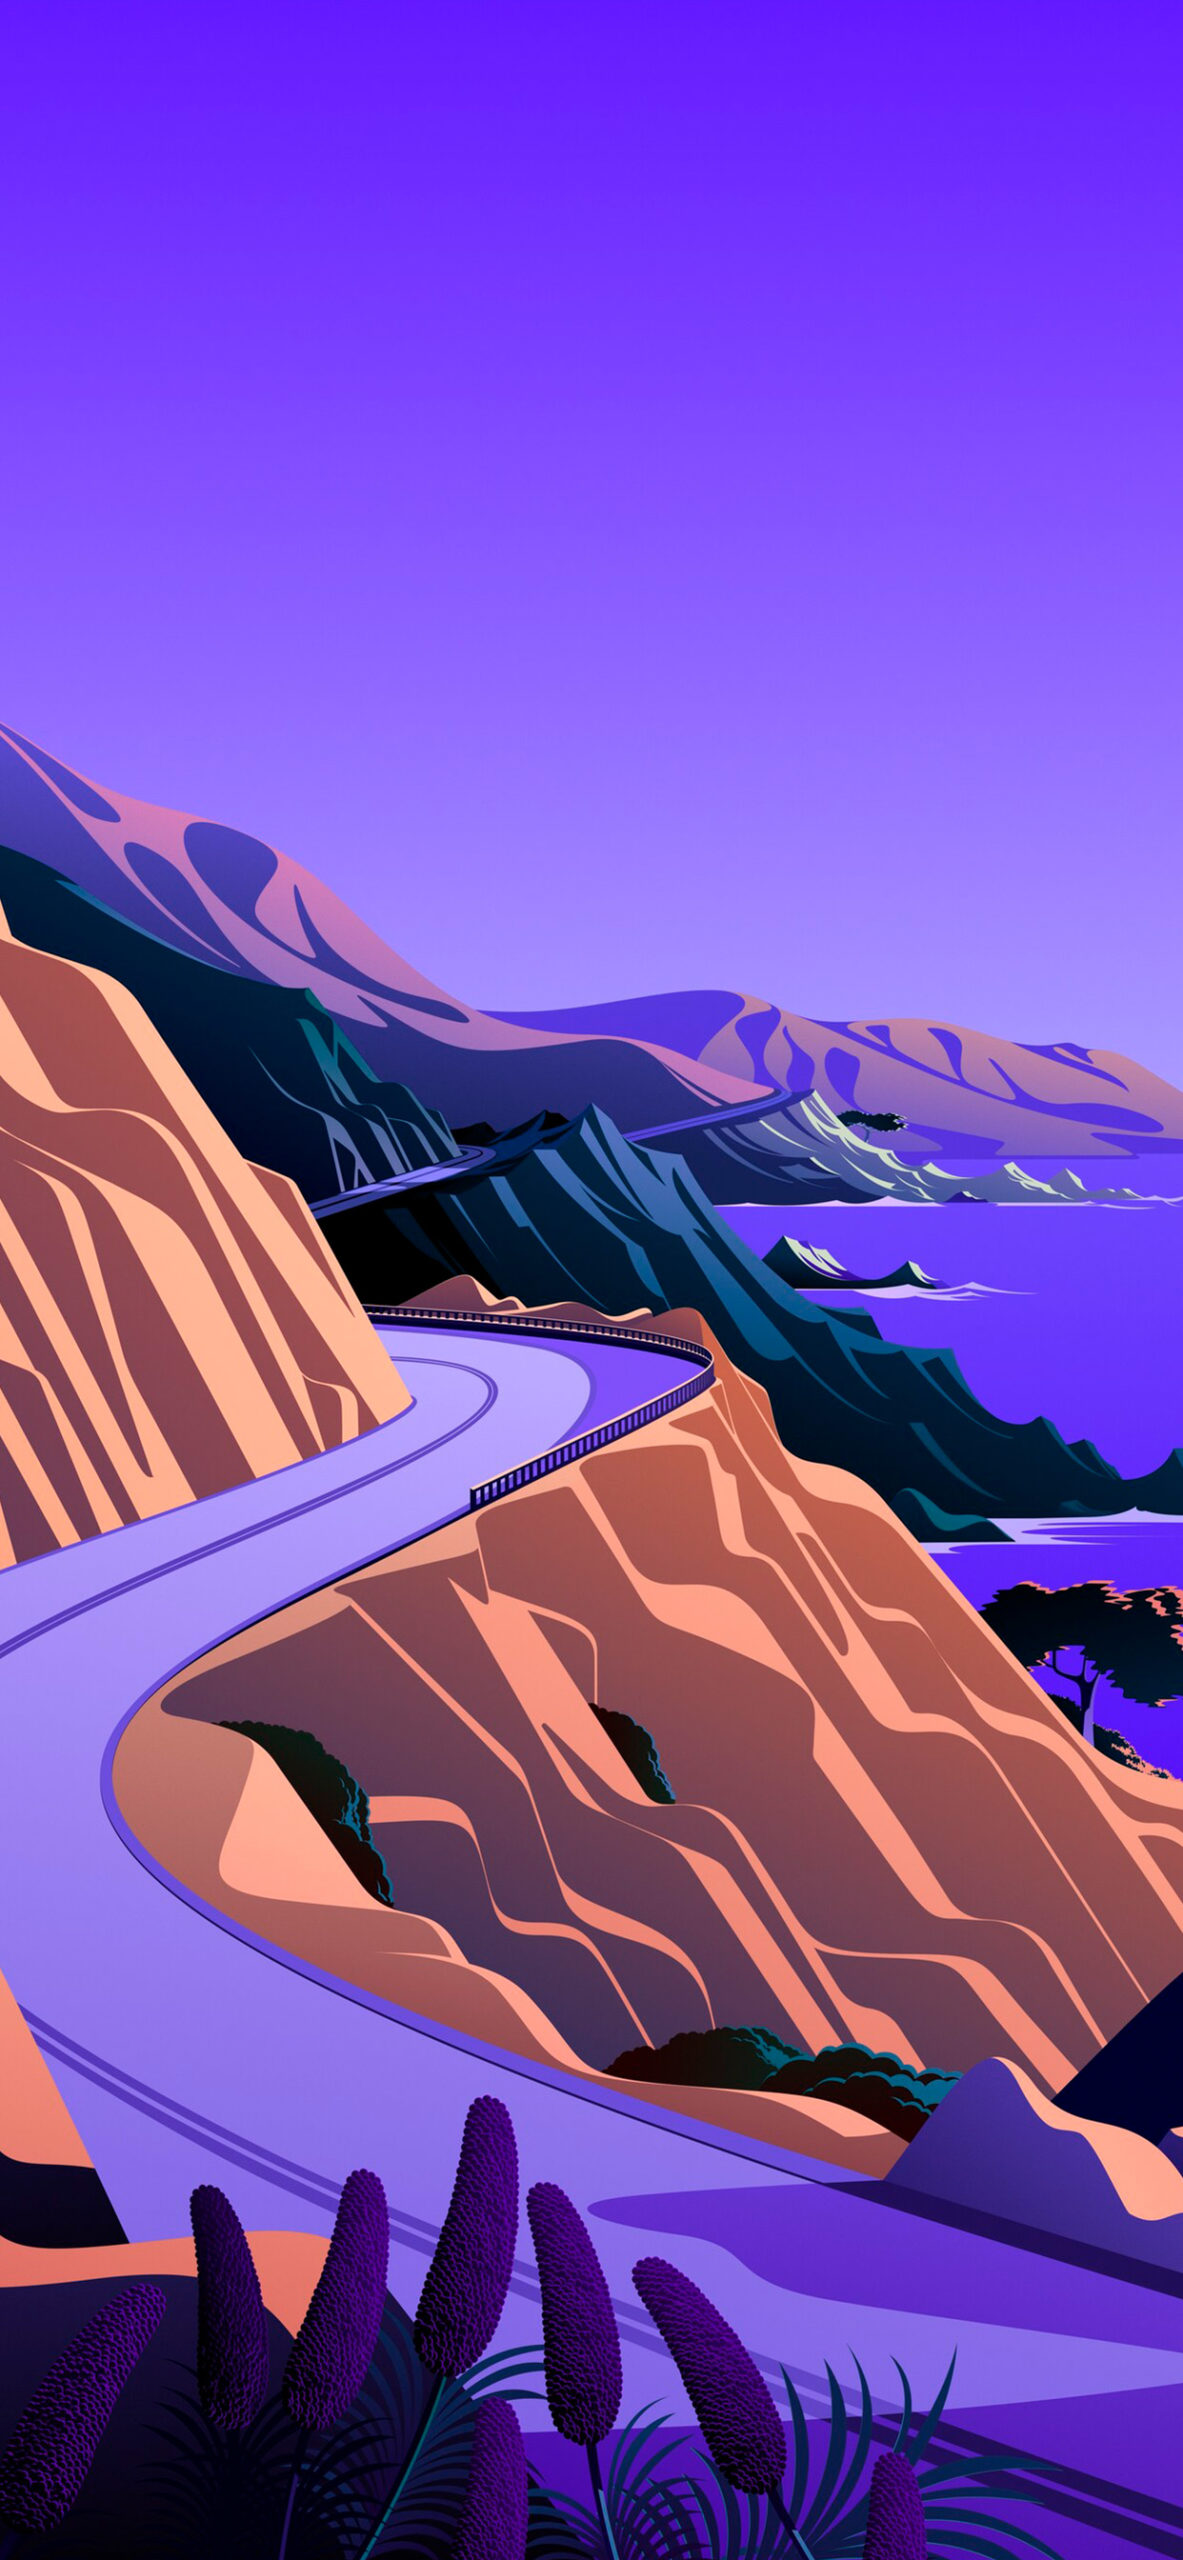 iphone wallpaper big sur cliffs2 scaled Mac OS Big Sur (Cliffs)